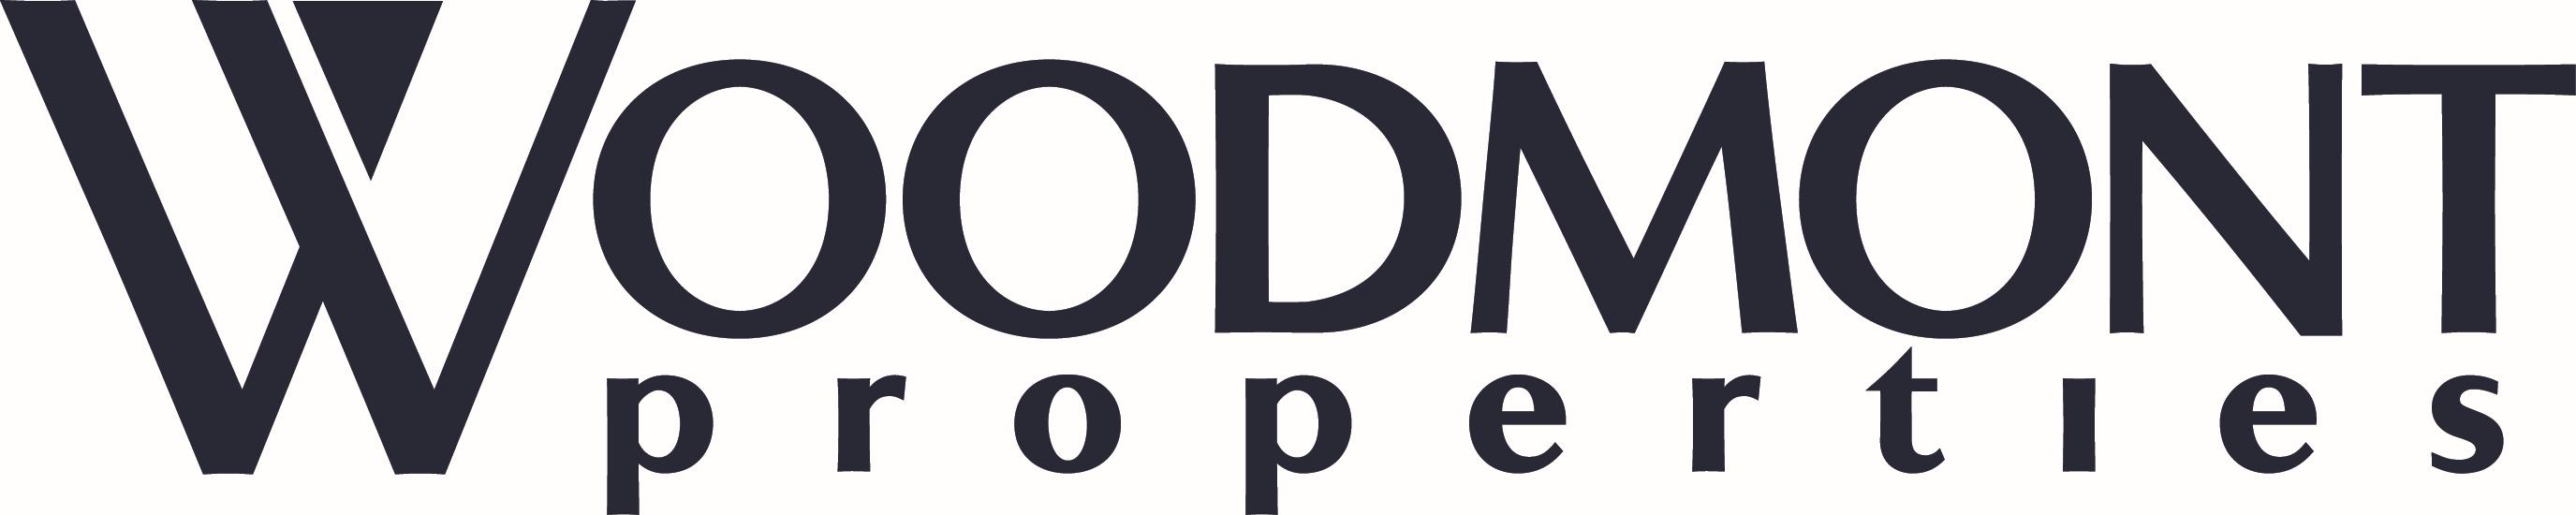 Woodmont Properties Llc logo